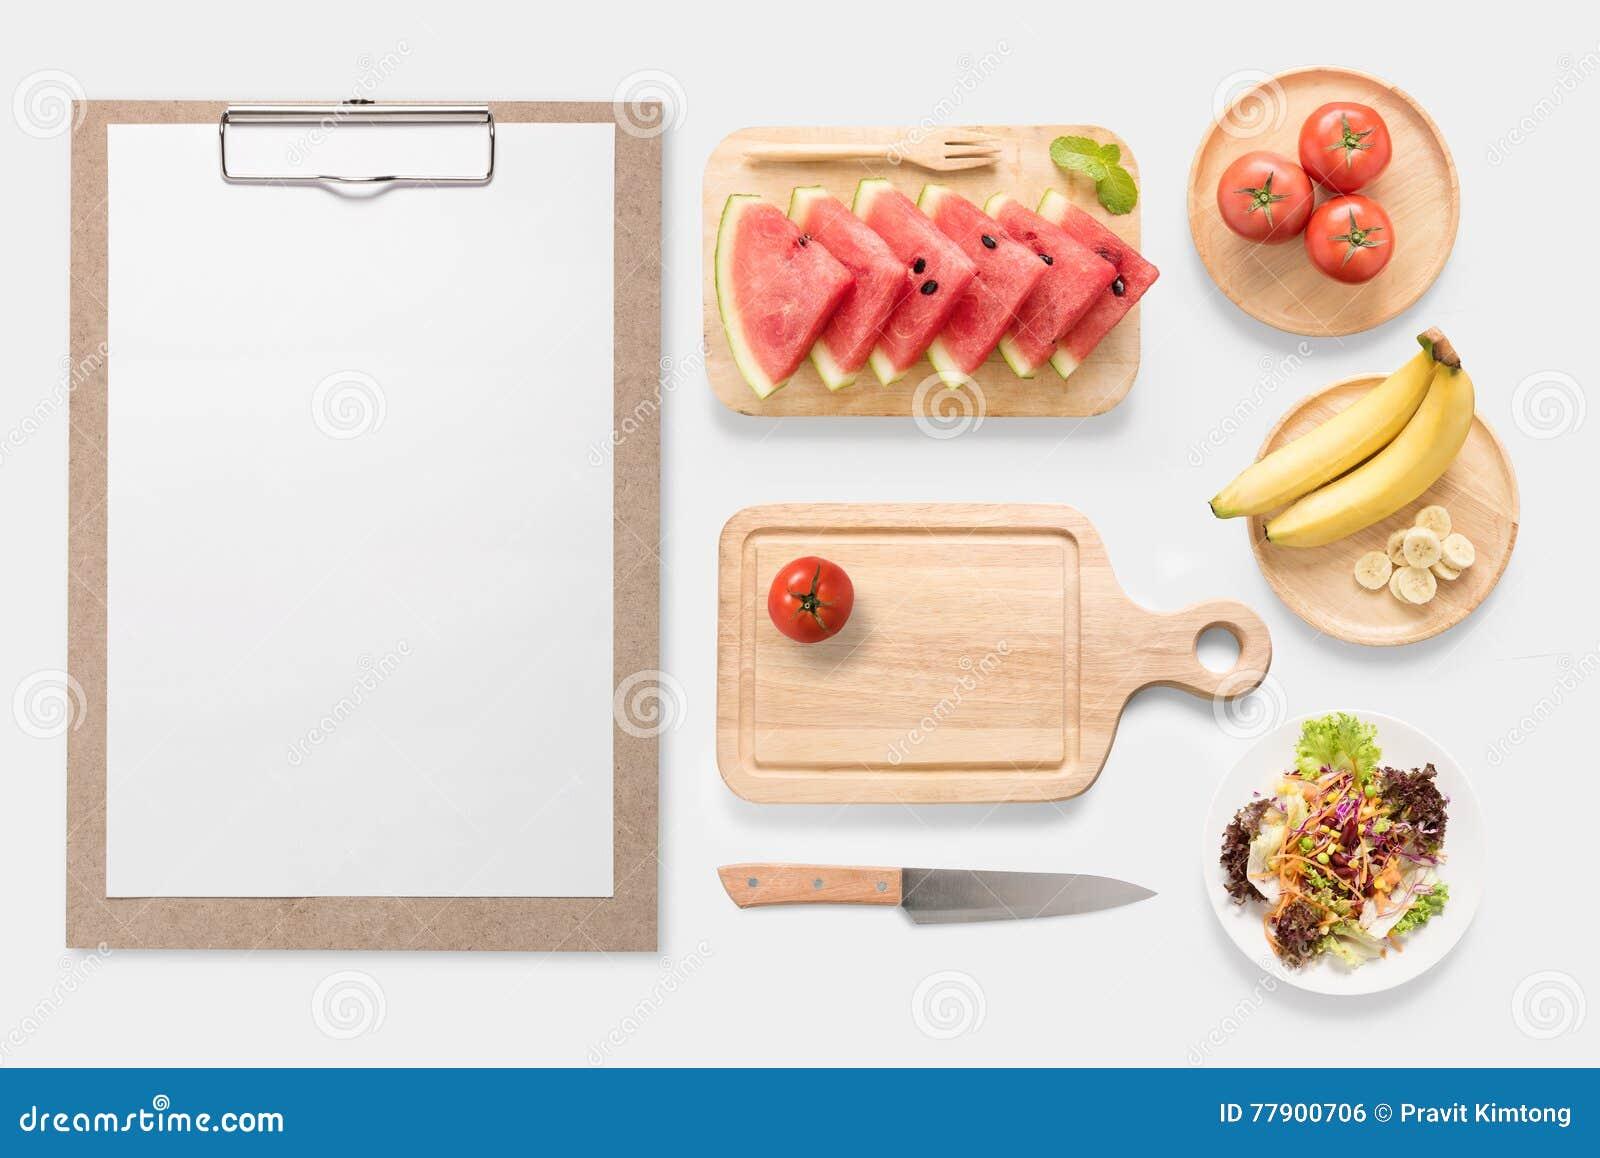 Ontwerpconcept model verse groente, vruchten en klembord